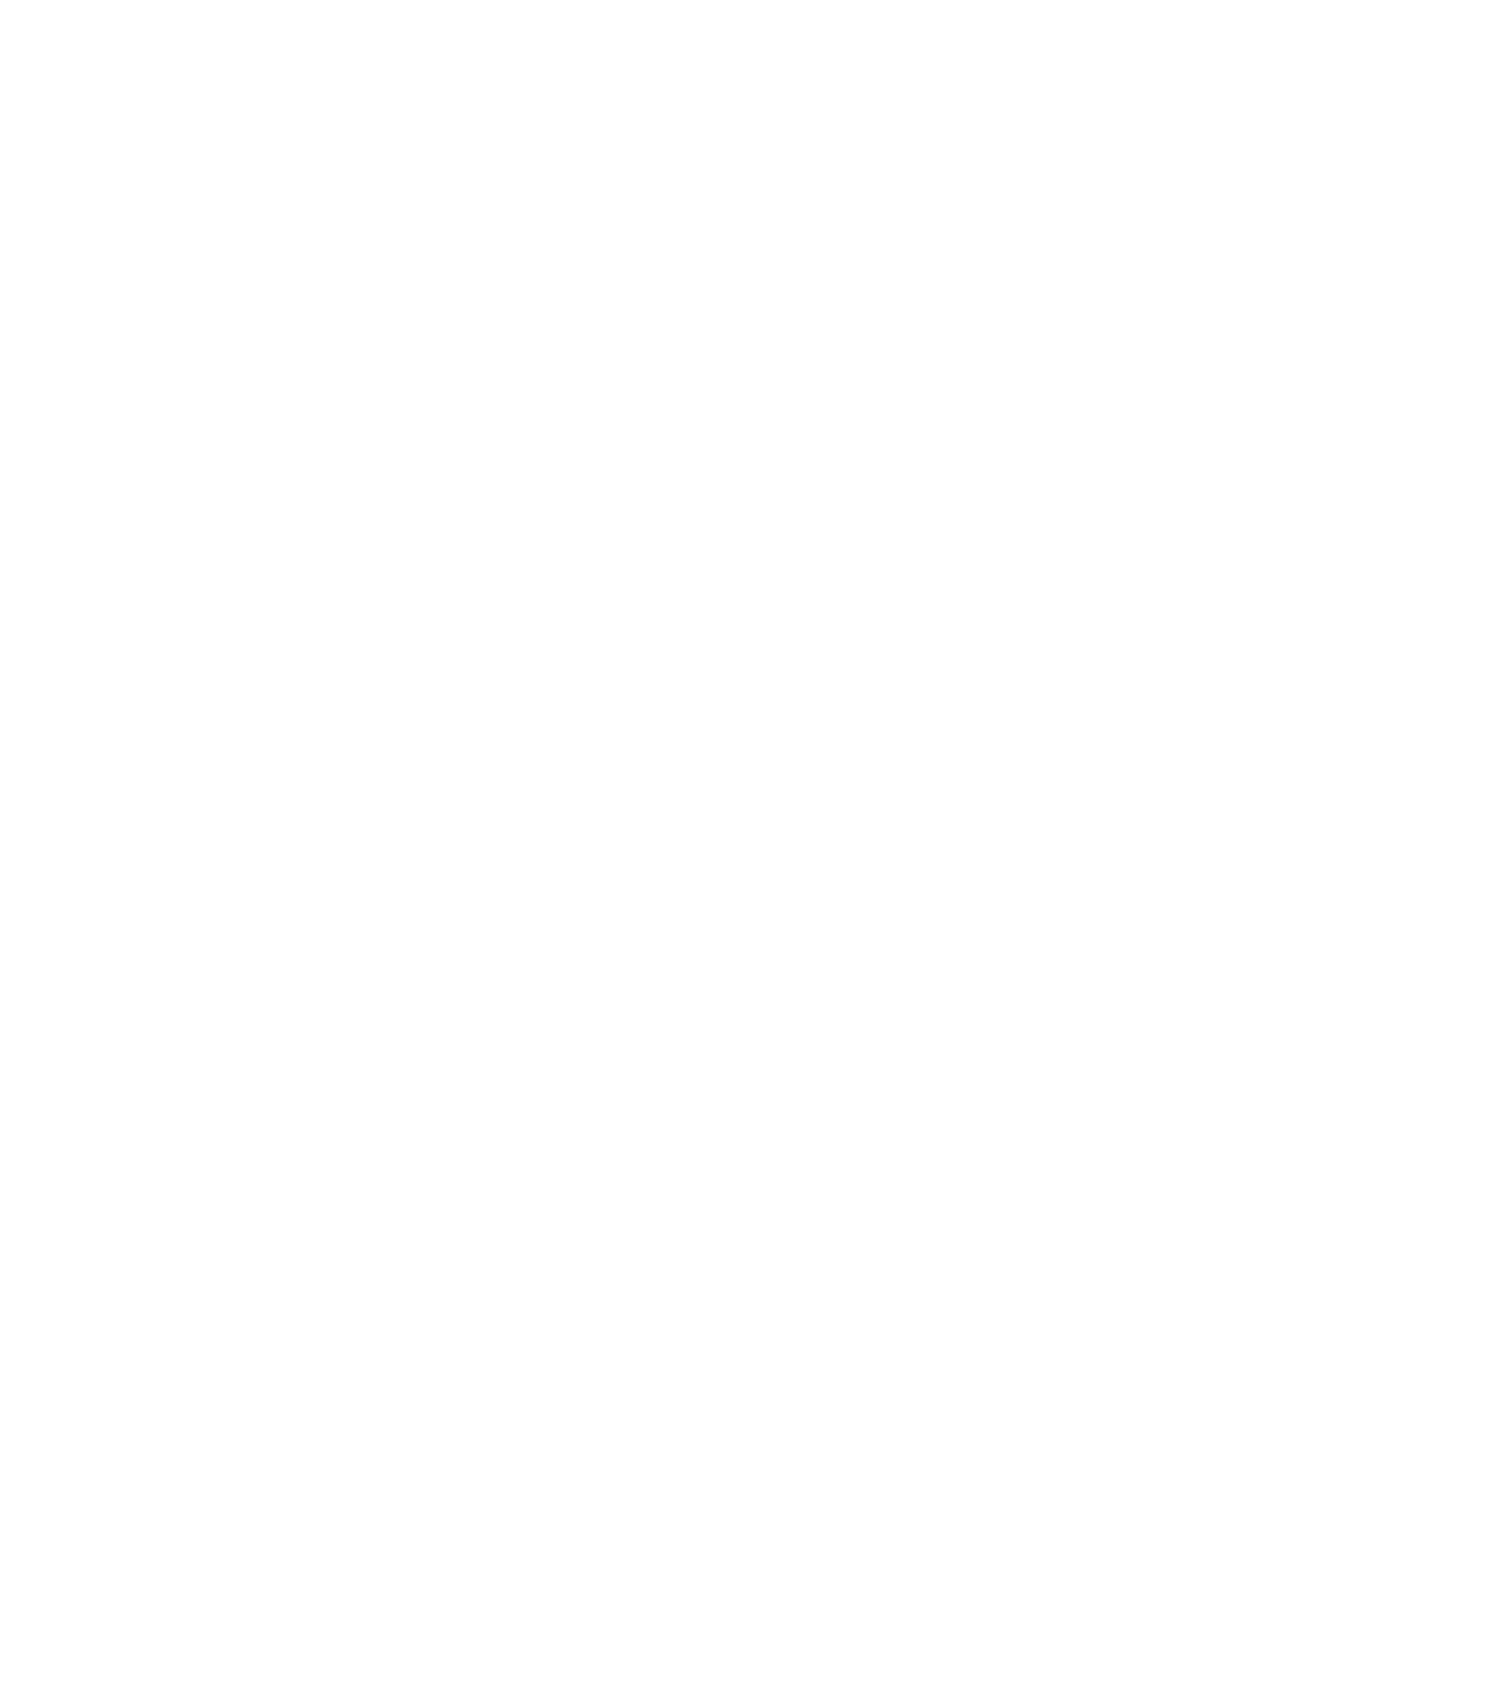 GO-TEXAN_CRC-logo-CMYK-2013.png